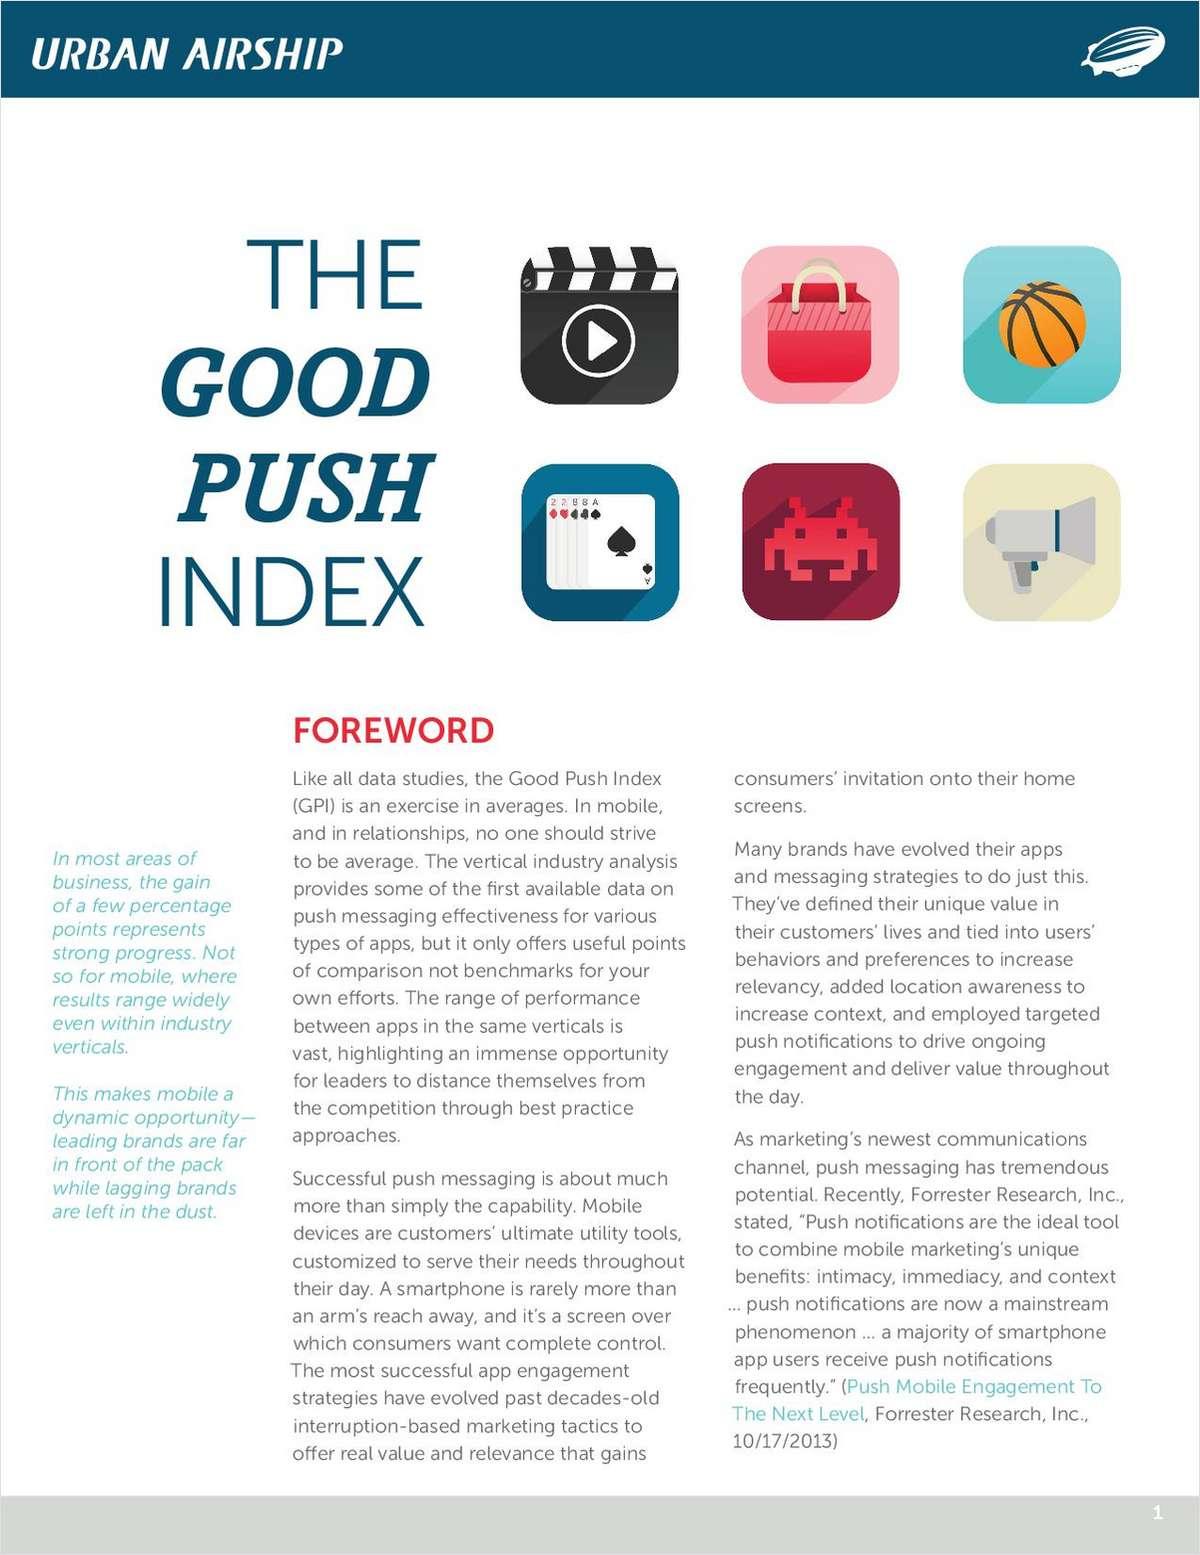 The Good Push Index